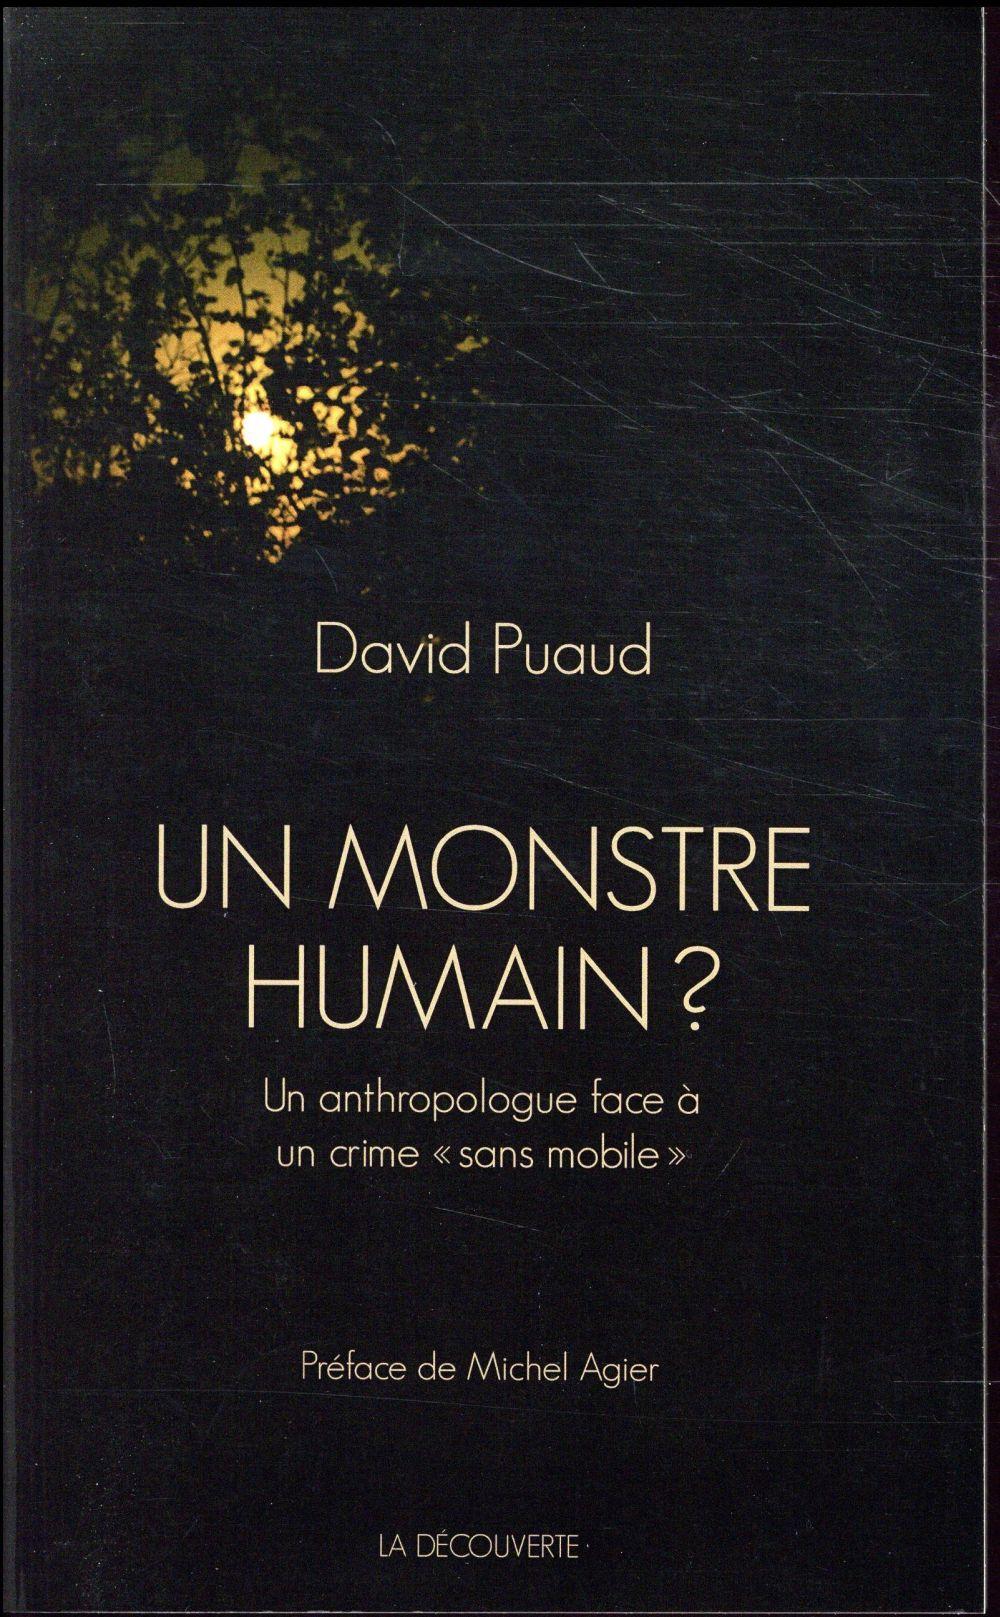 UN MONSTRE HUMAIN ?